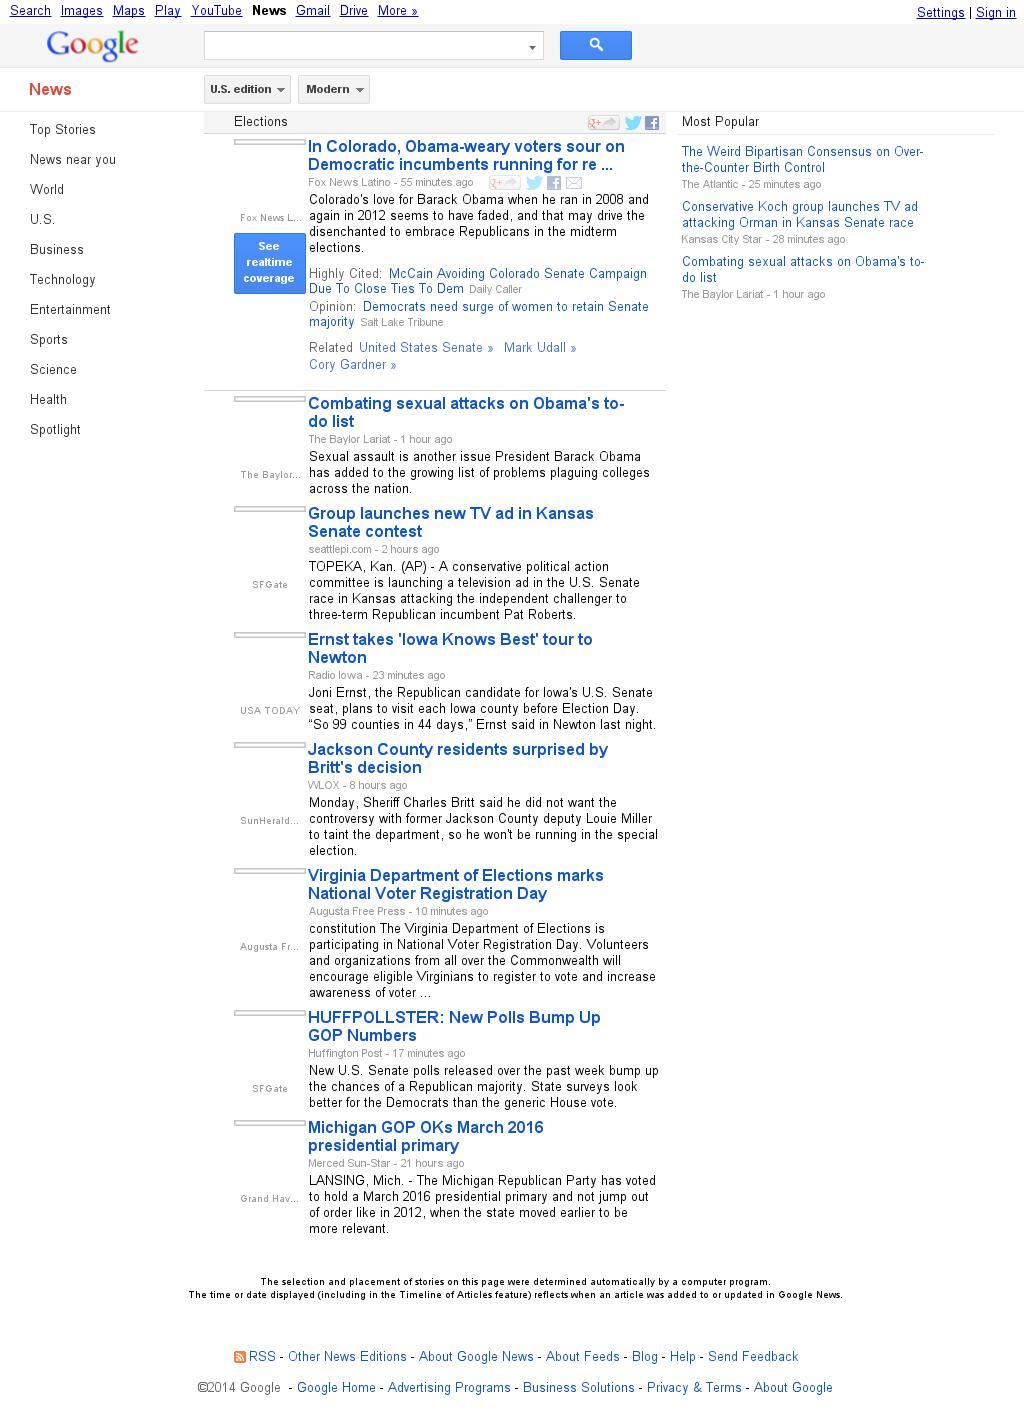 Google News: Elections at Tuesday Sept. 23, 2014, 1:06 p.m. UTC